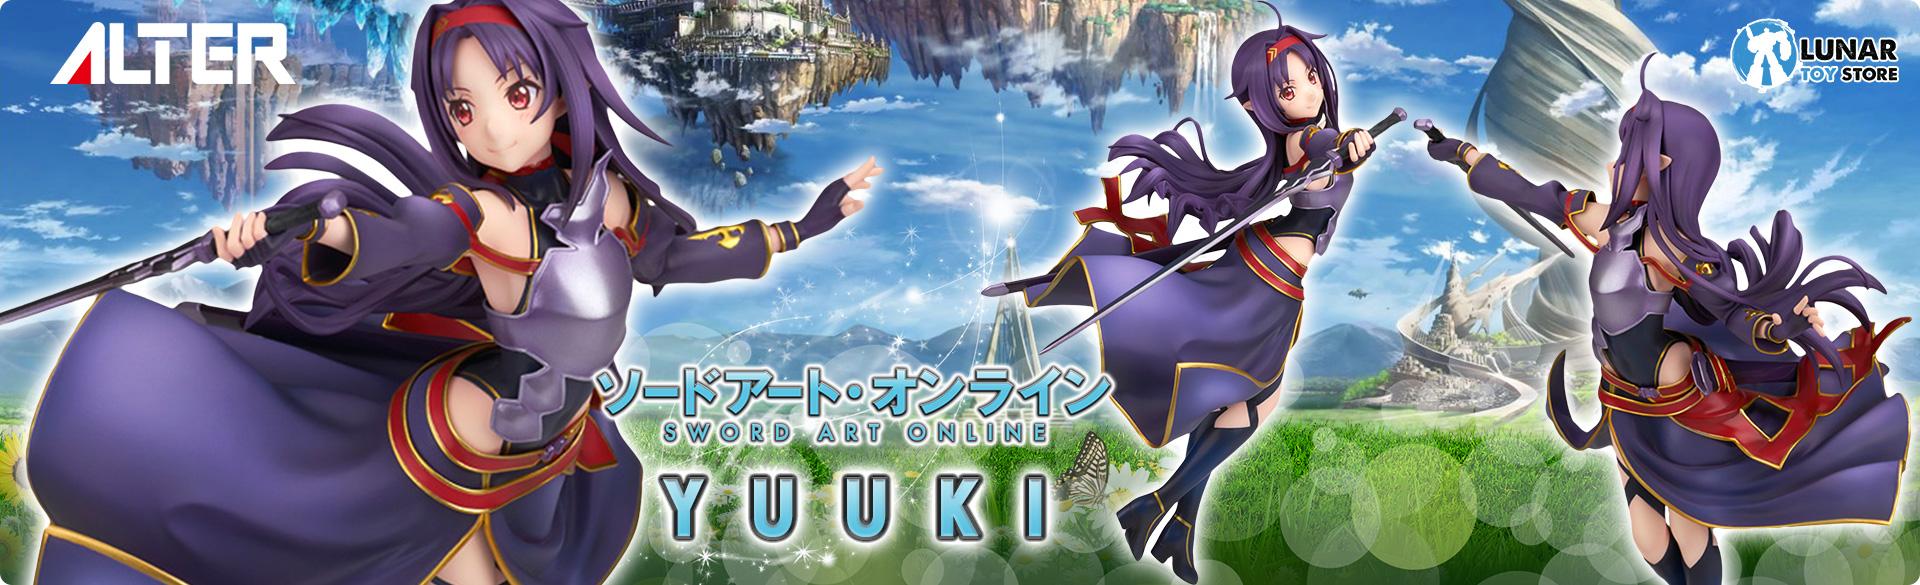 Sword Art Onilne Yuuki